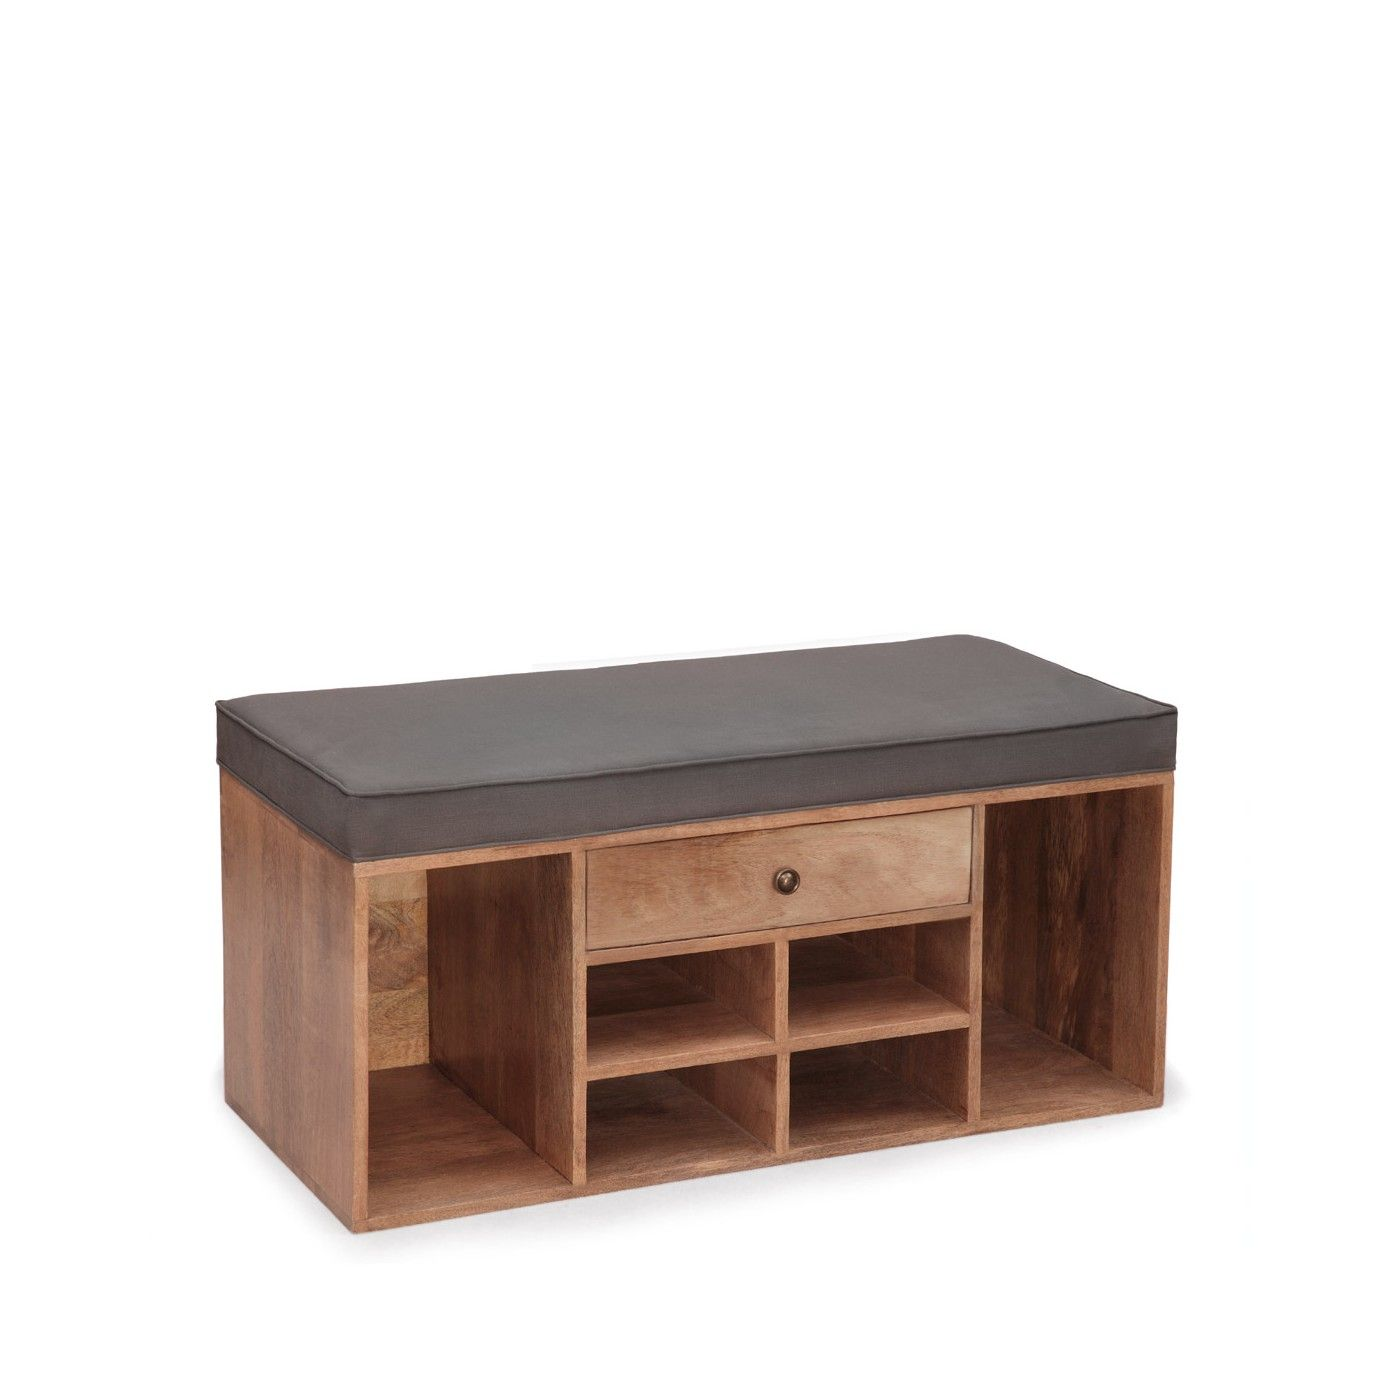 Shoe Storage Bench With Drawer Grey